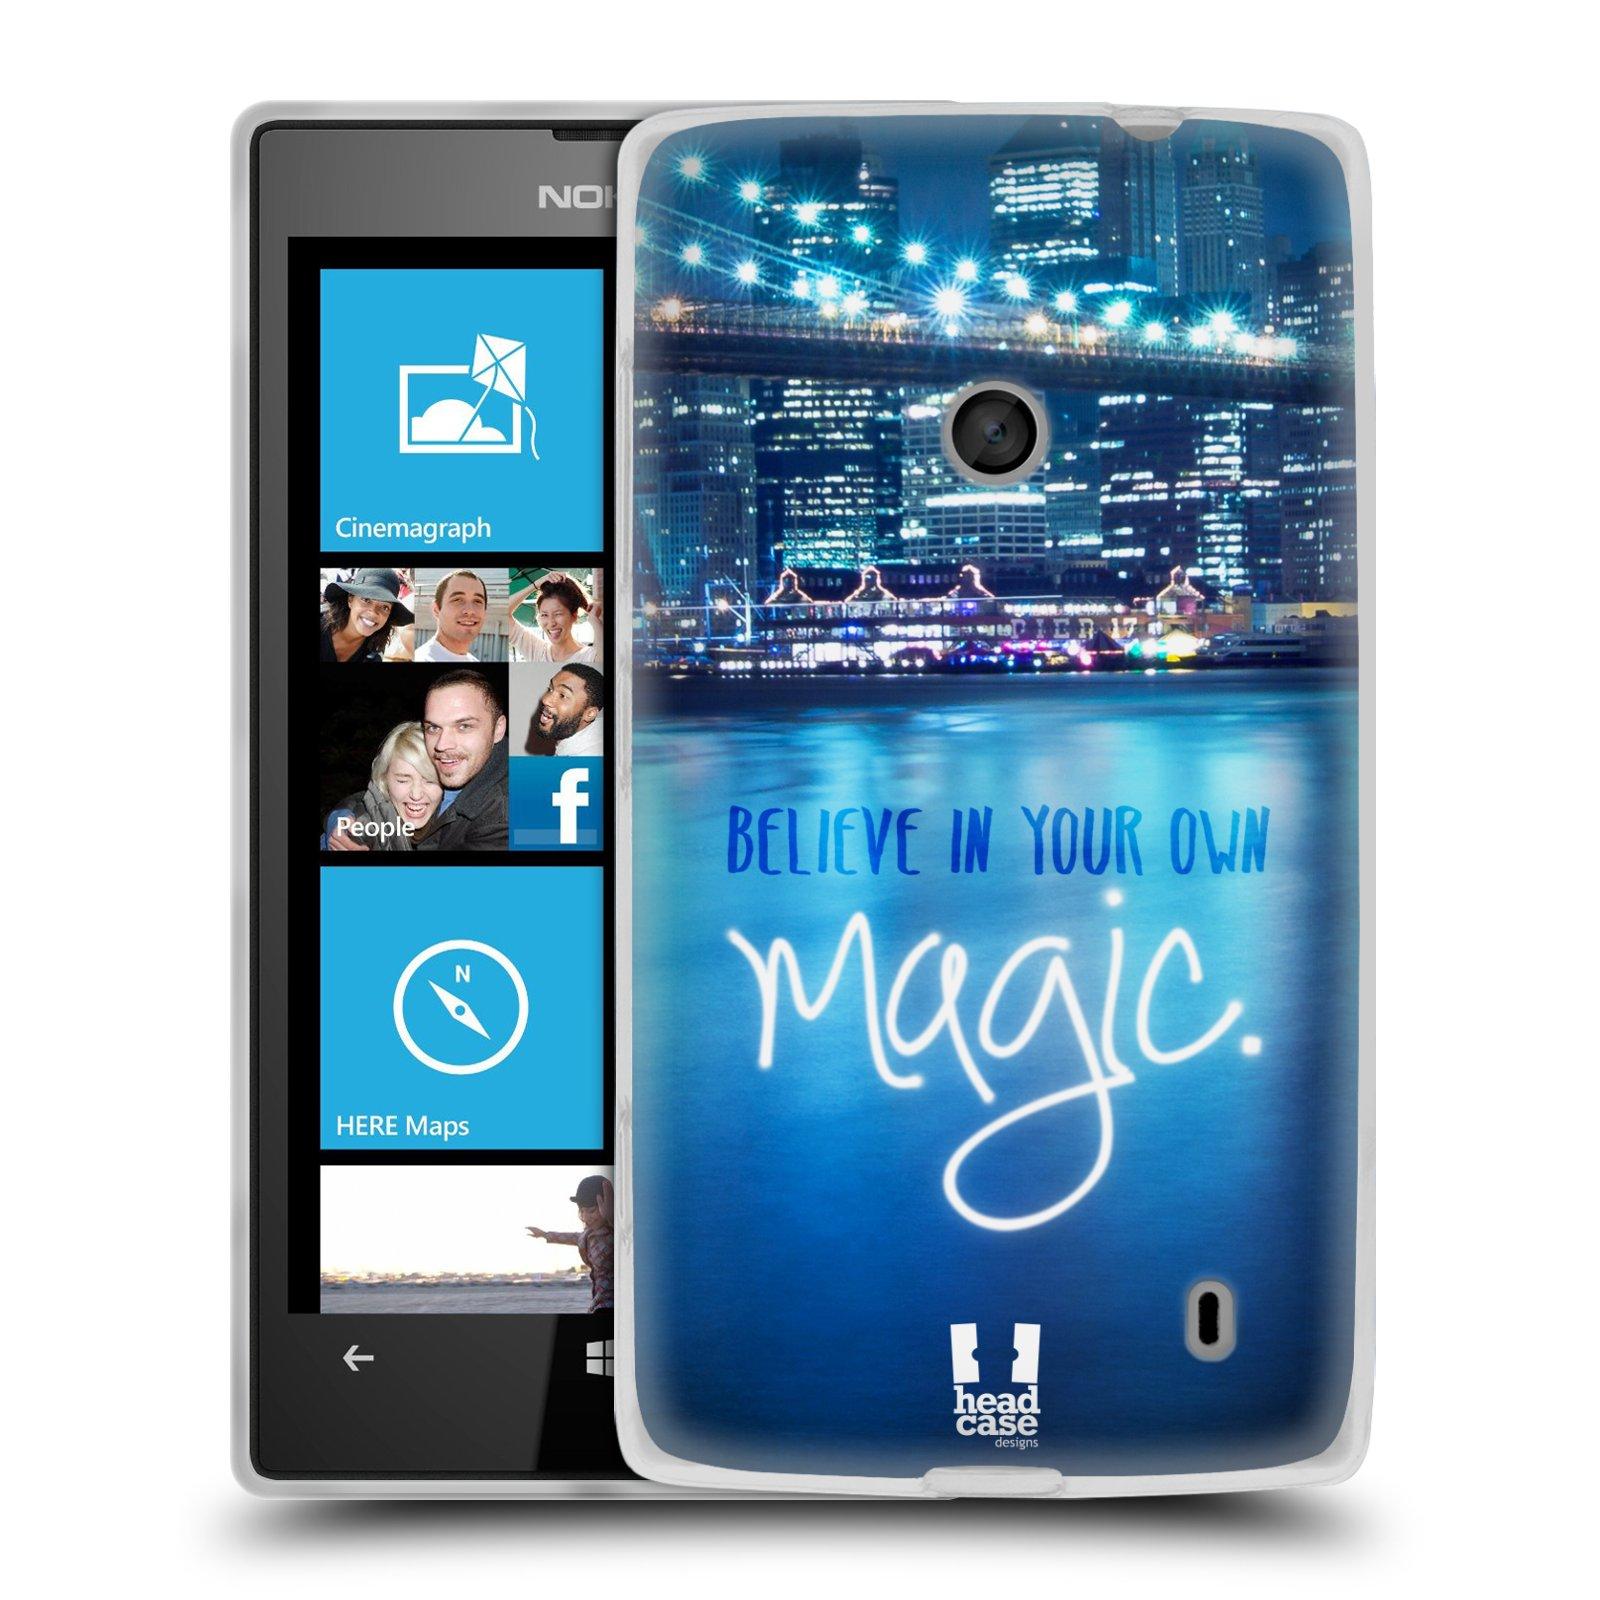 Silikonové pouzdro na mobil Nokia Lumia 520 HEAD CASE MAGICAL (Silikonový Kryt či obal na mobilní telefon Nokia Lumia 520)